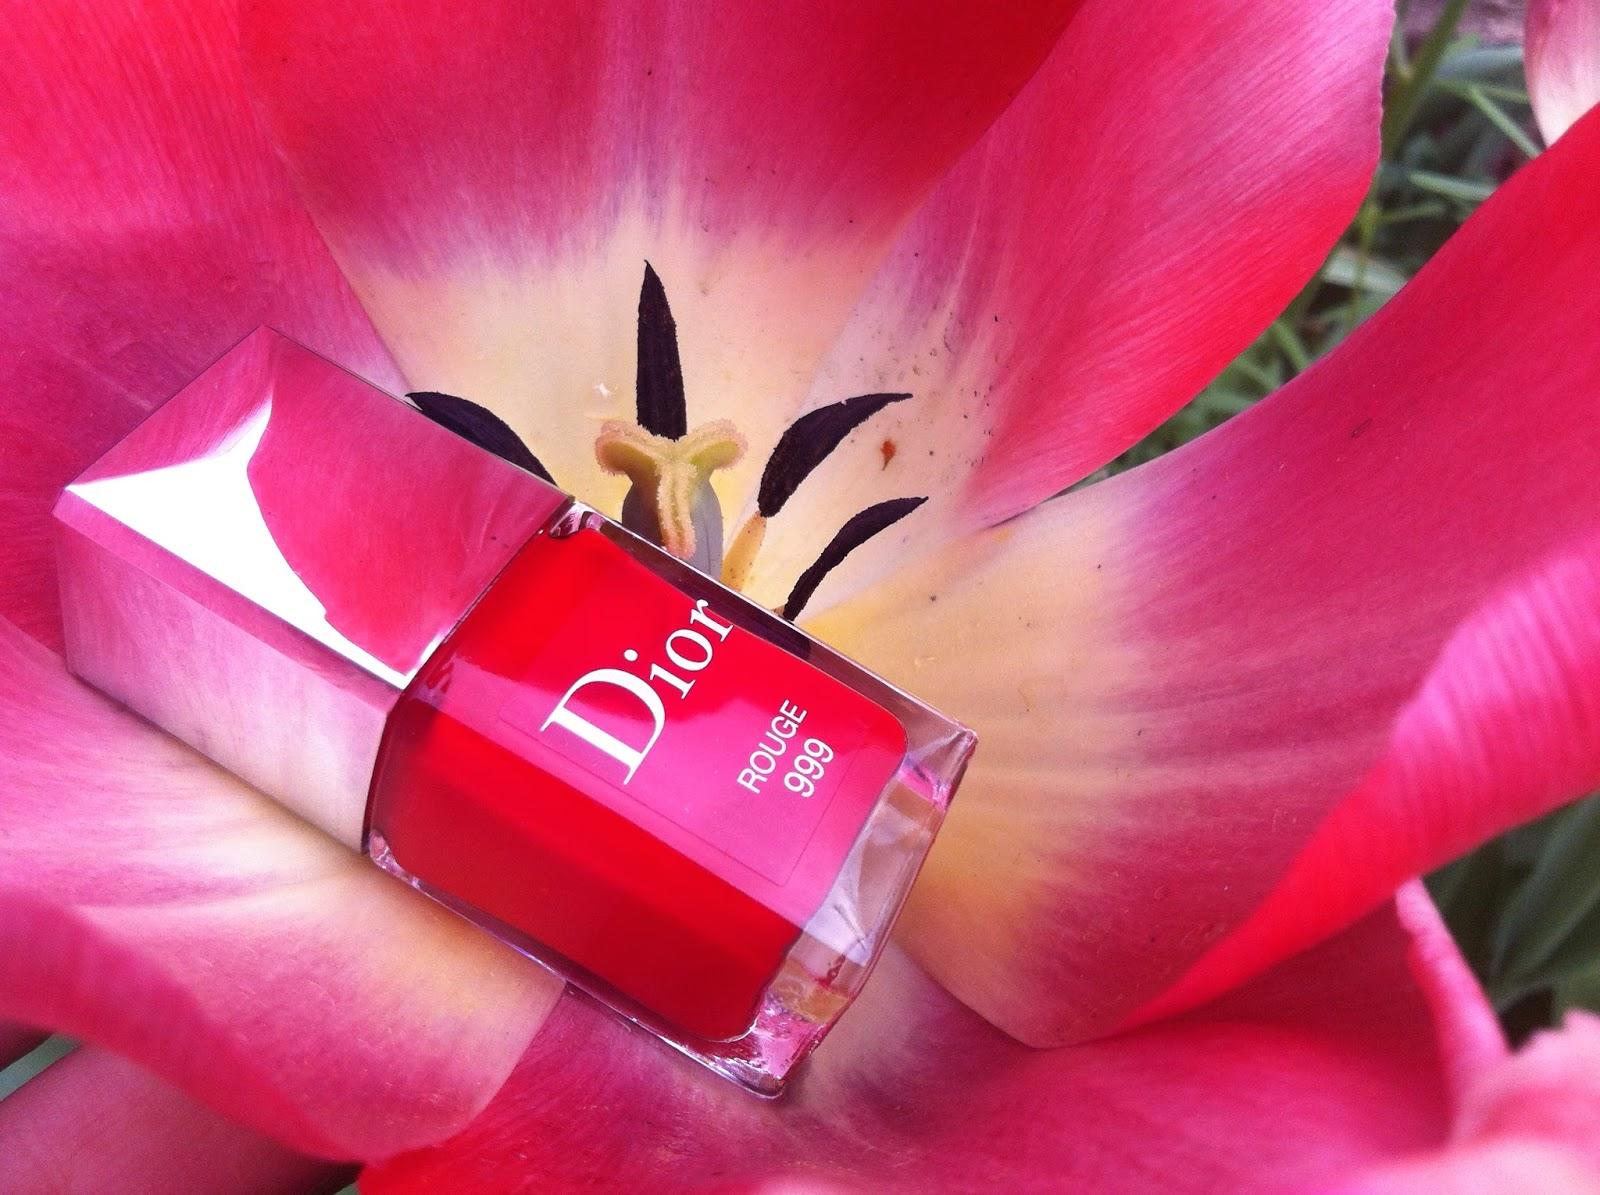 Dior ADDICT Fluid Stick, Dior Vernis 2014, Dior make up primavera 2014, Dior Pandore, Dior Mirage, Dior Wonderland, Dior Aventure, dior rouge 999